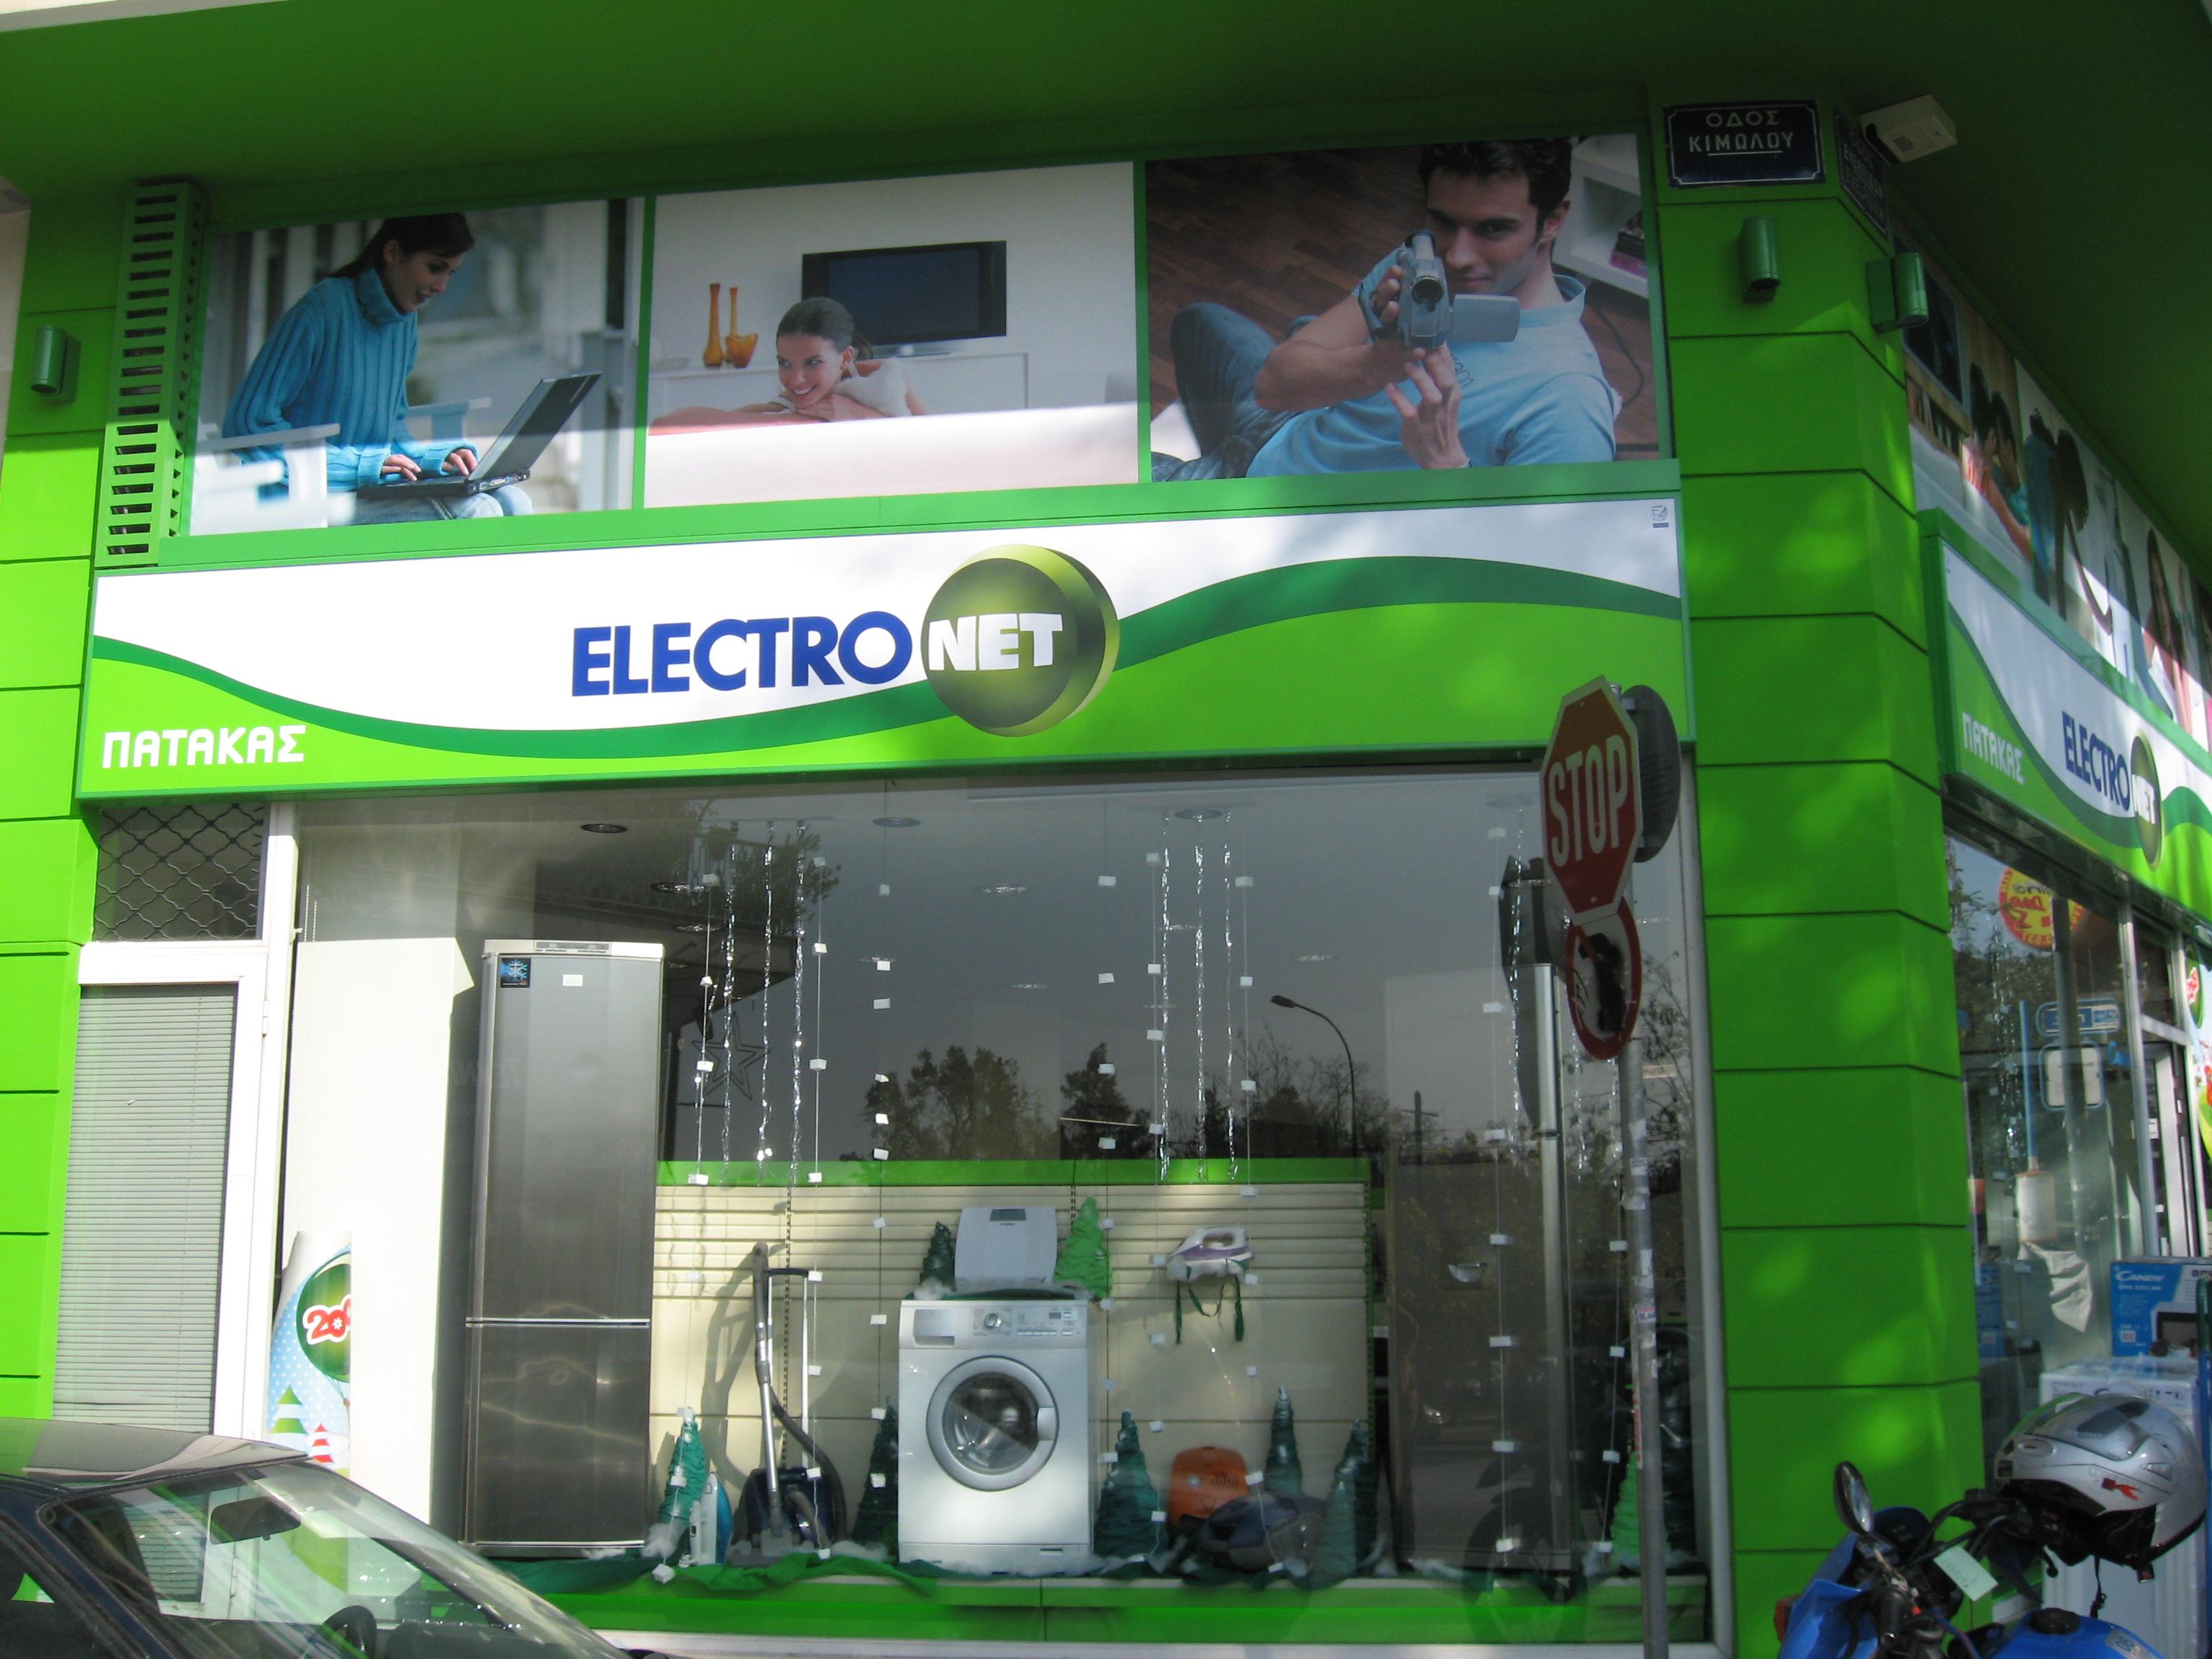 H Electronet αντέχει στα χρόνια της οικονομικής ύφεσης